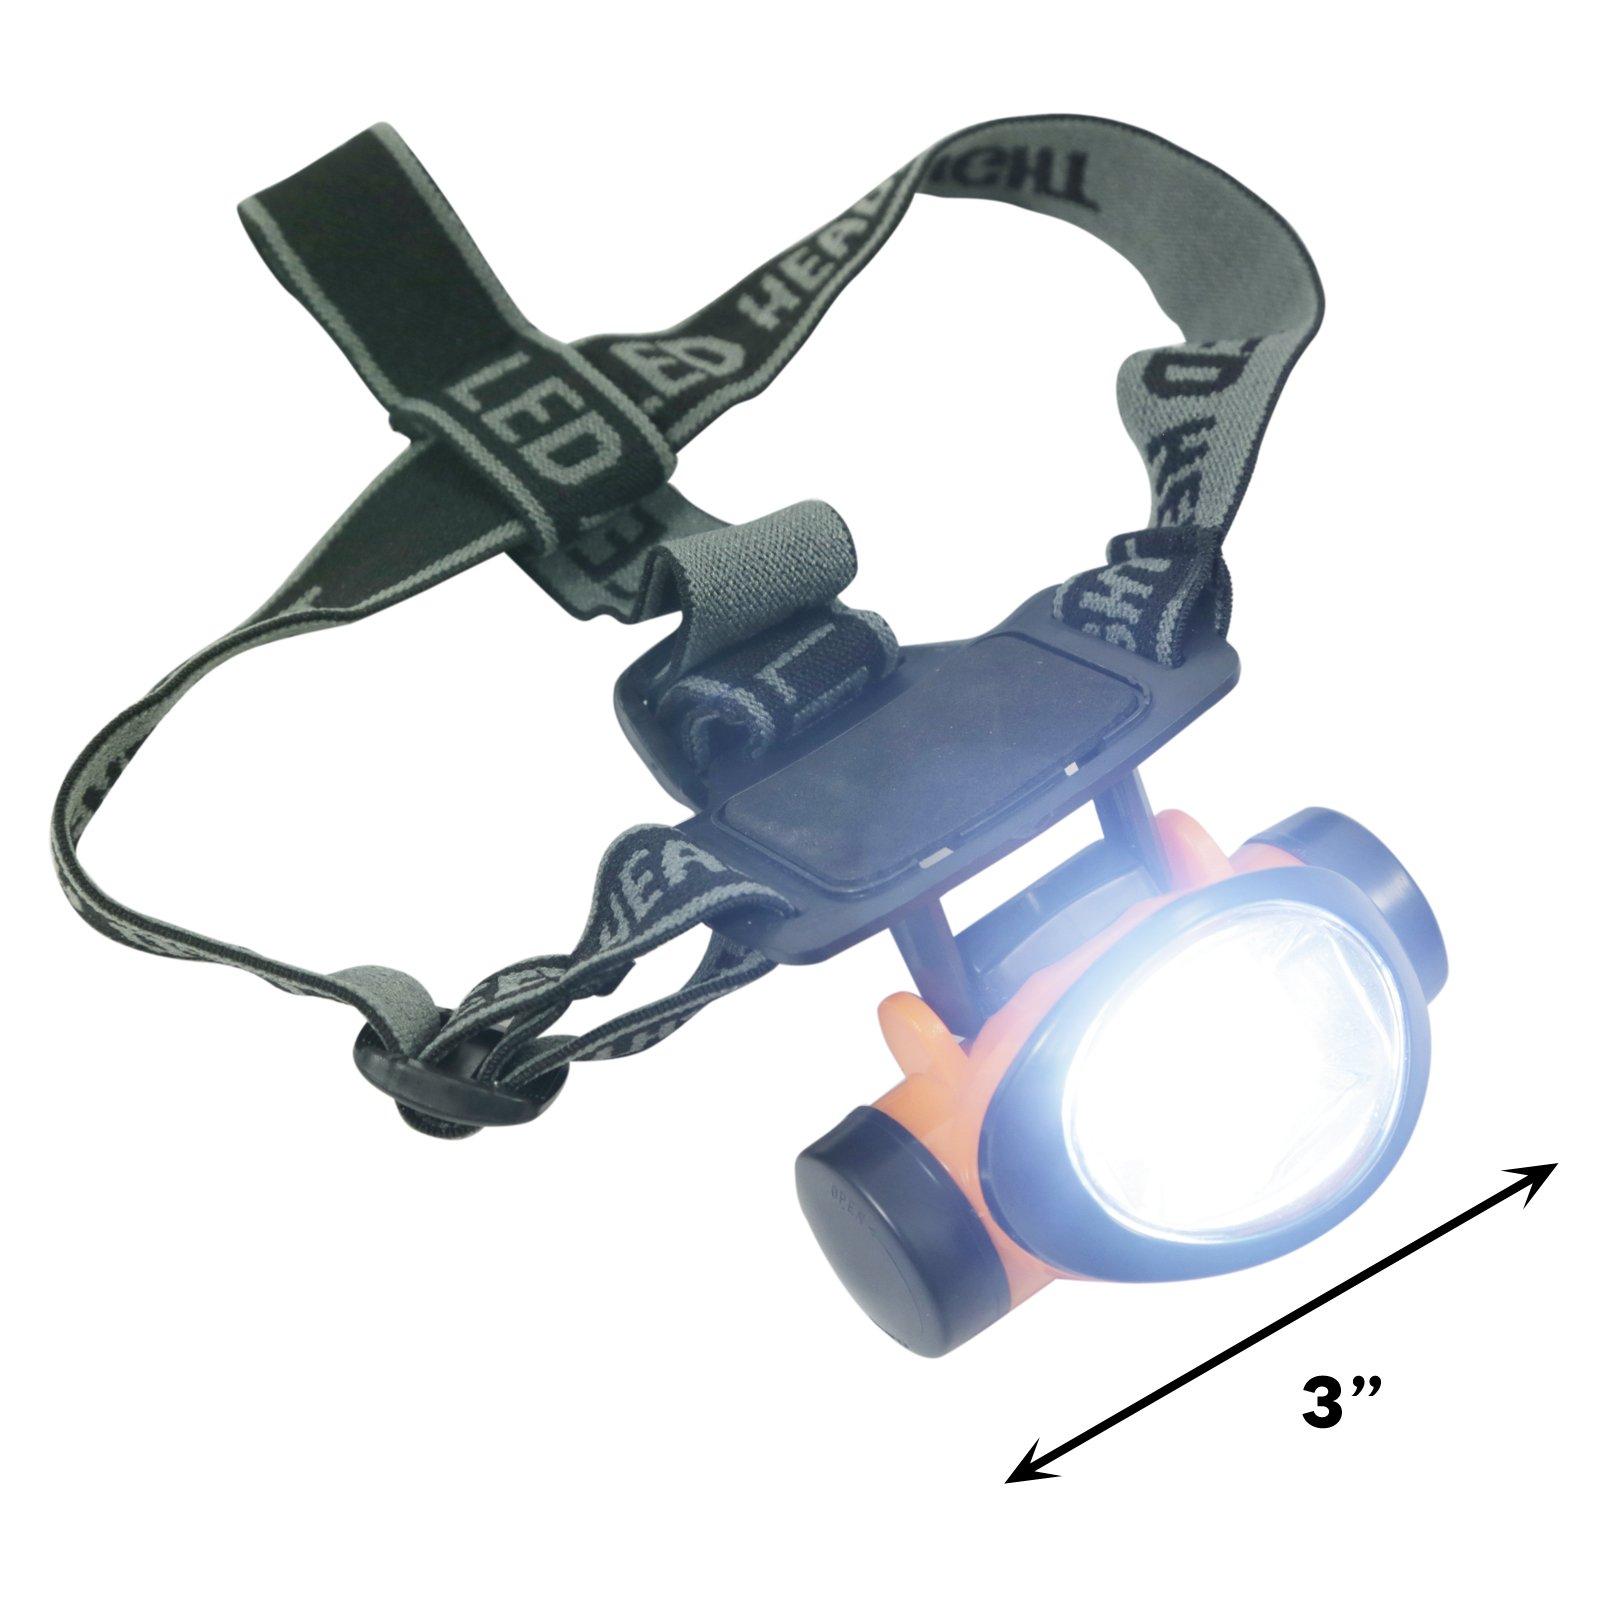 ASR Outdoor 3 Watt Super Bright 200 Lumen COB LED Head Lamp Adjustable - Orange